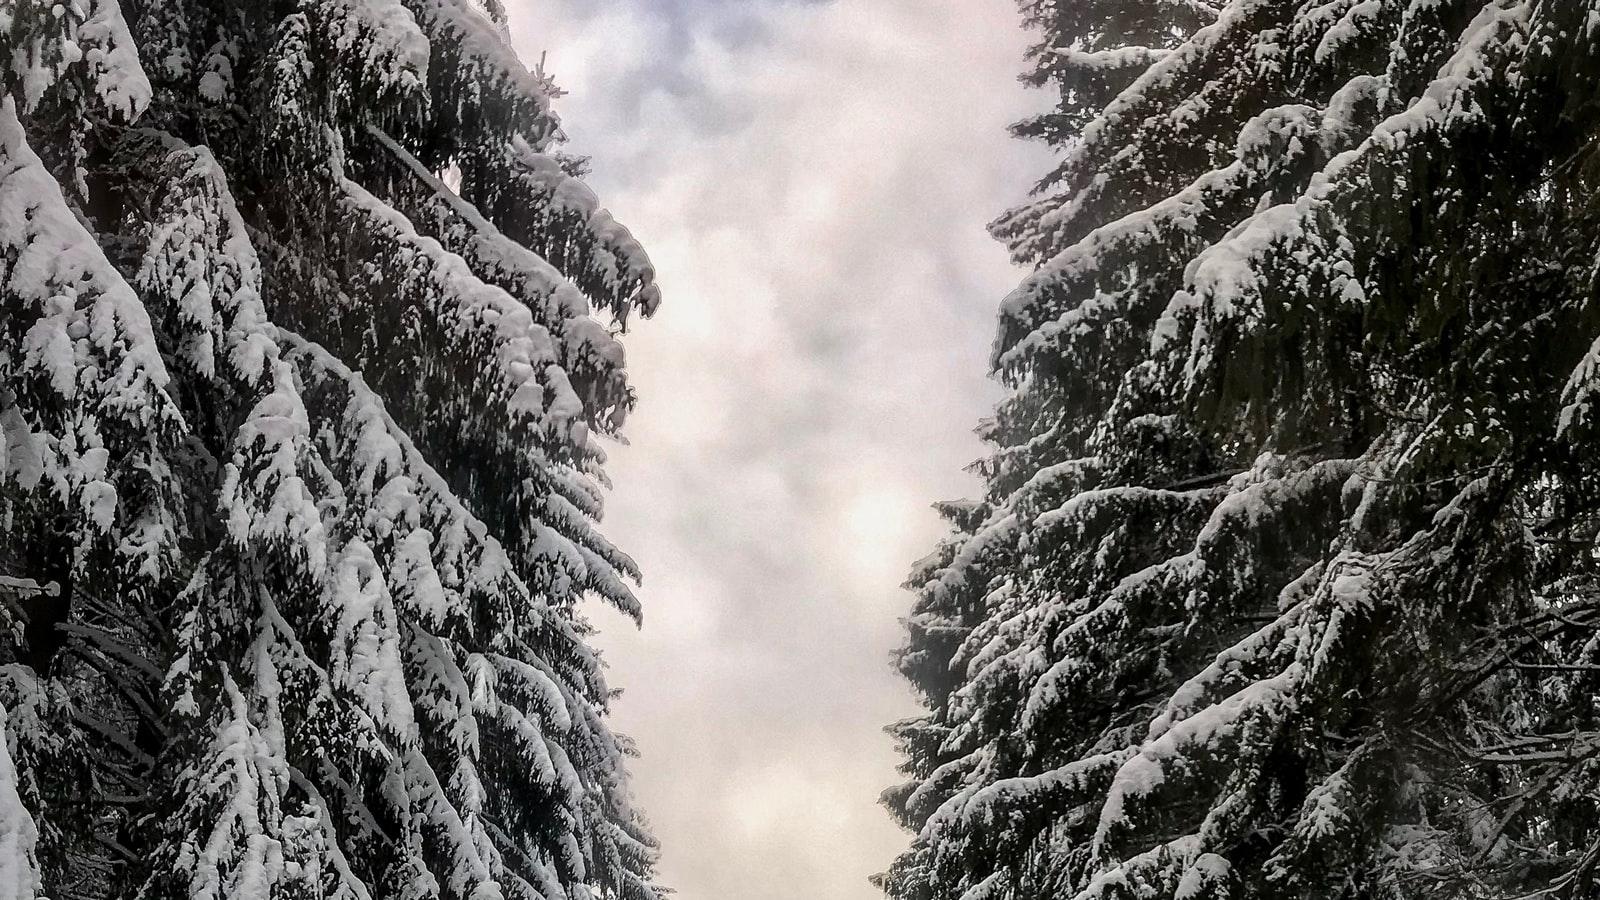 HALLOWEEN TREE CERAMIC